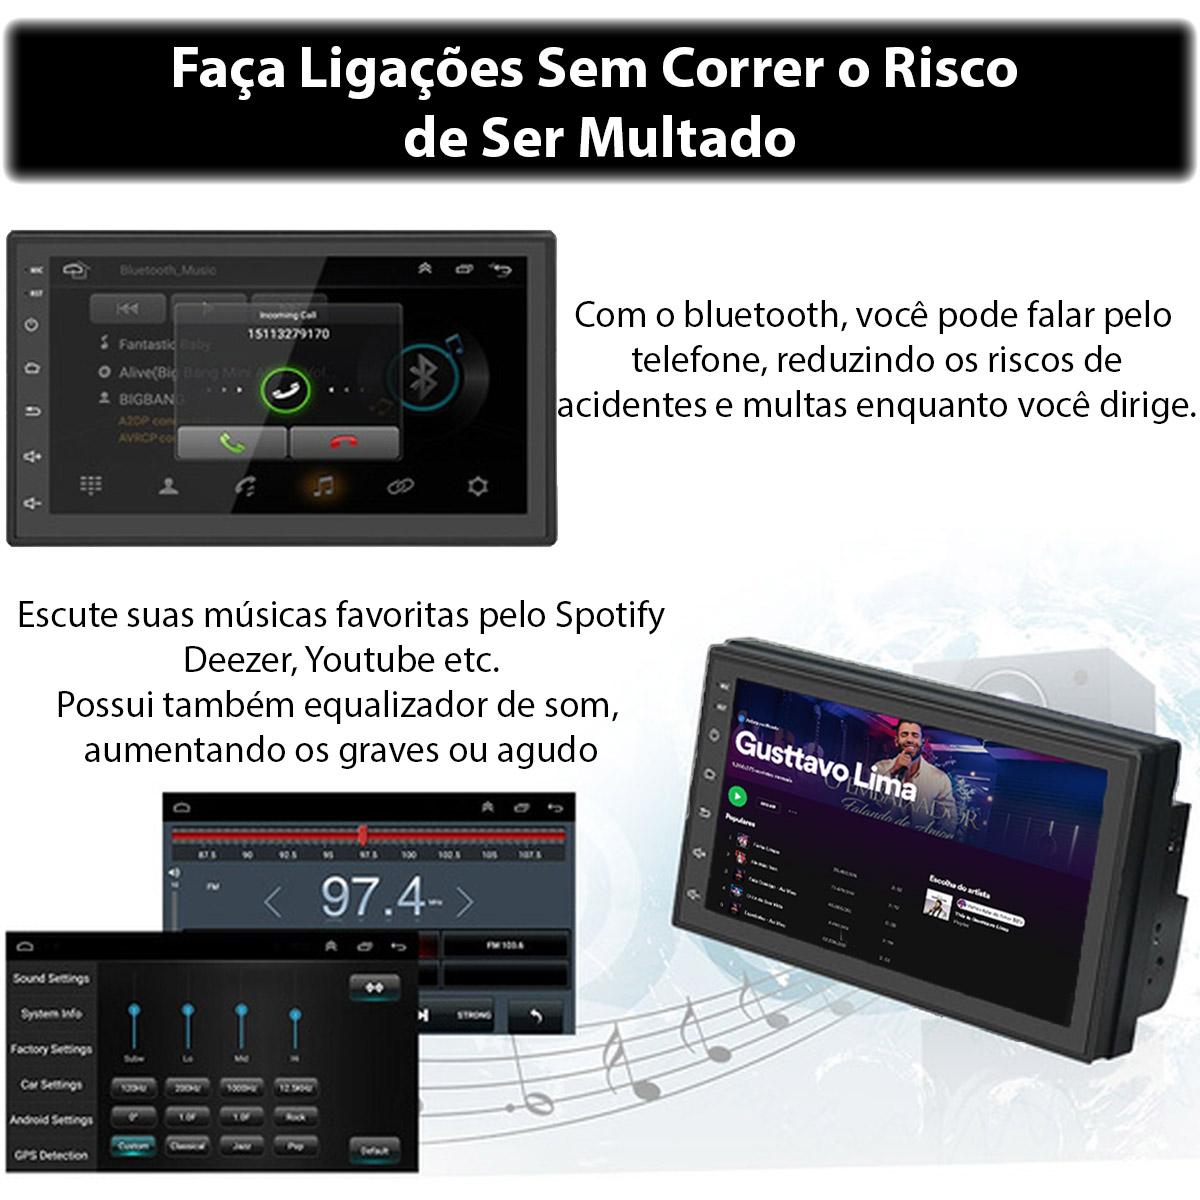 Central Multimidia com Moldura Fiat Toro Mp5 Bluetooth Usb Touchscreen 7 Polegadas 2 Din Black Piano Atacado